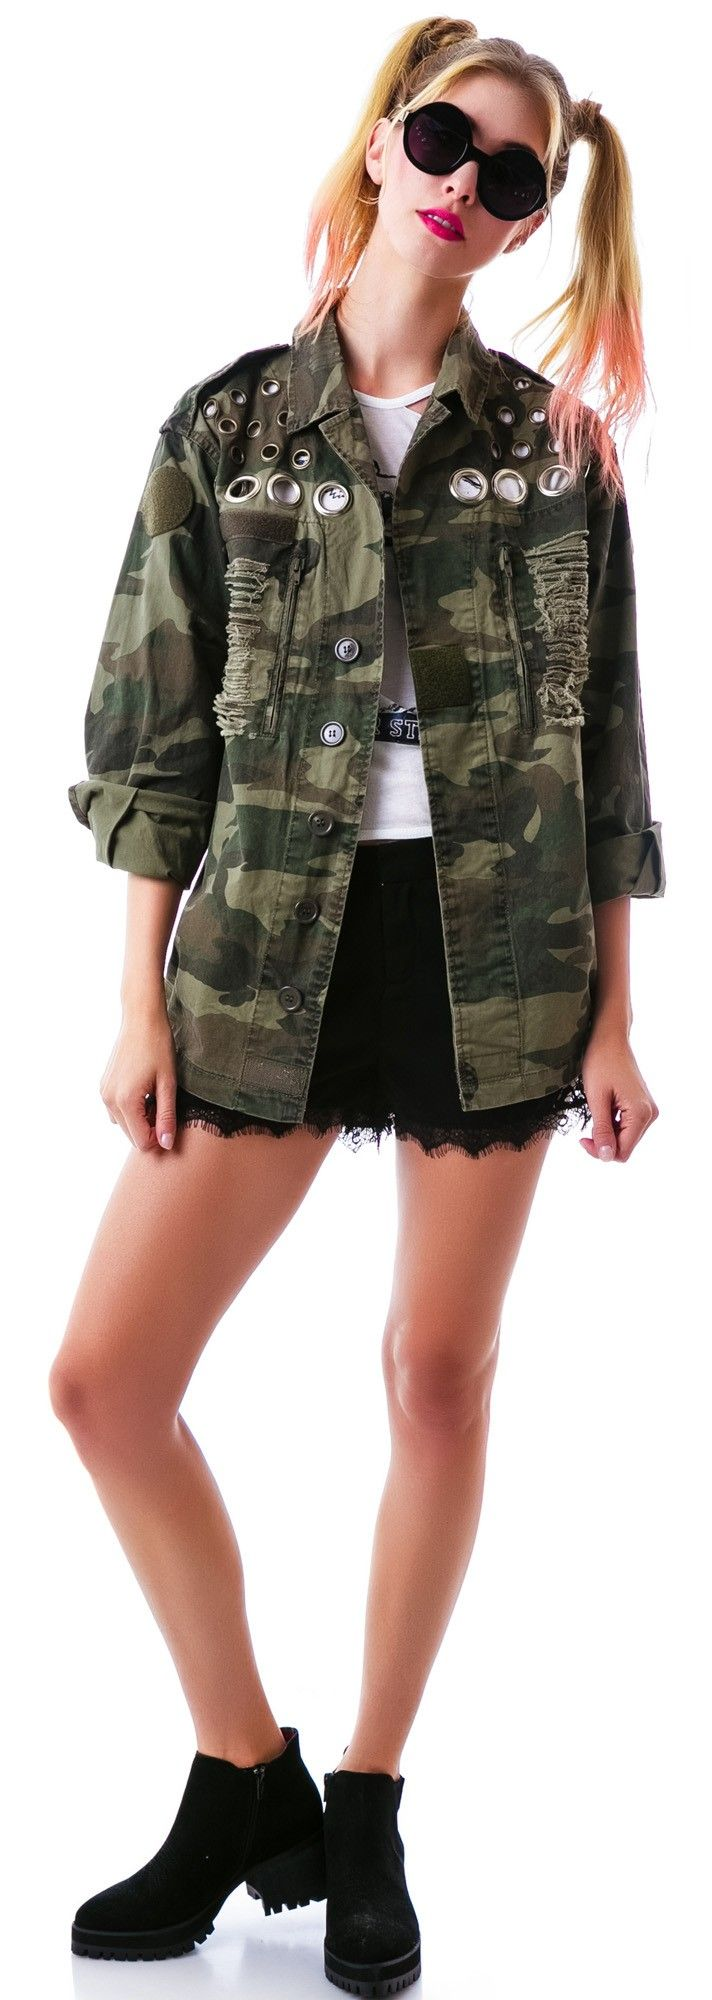 Call of Duty Camo Jacket #boydollsincamo